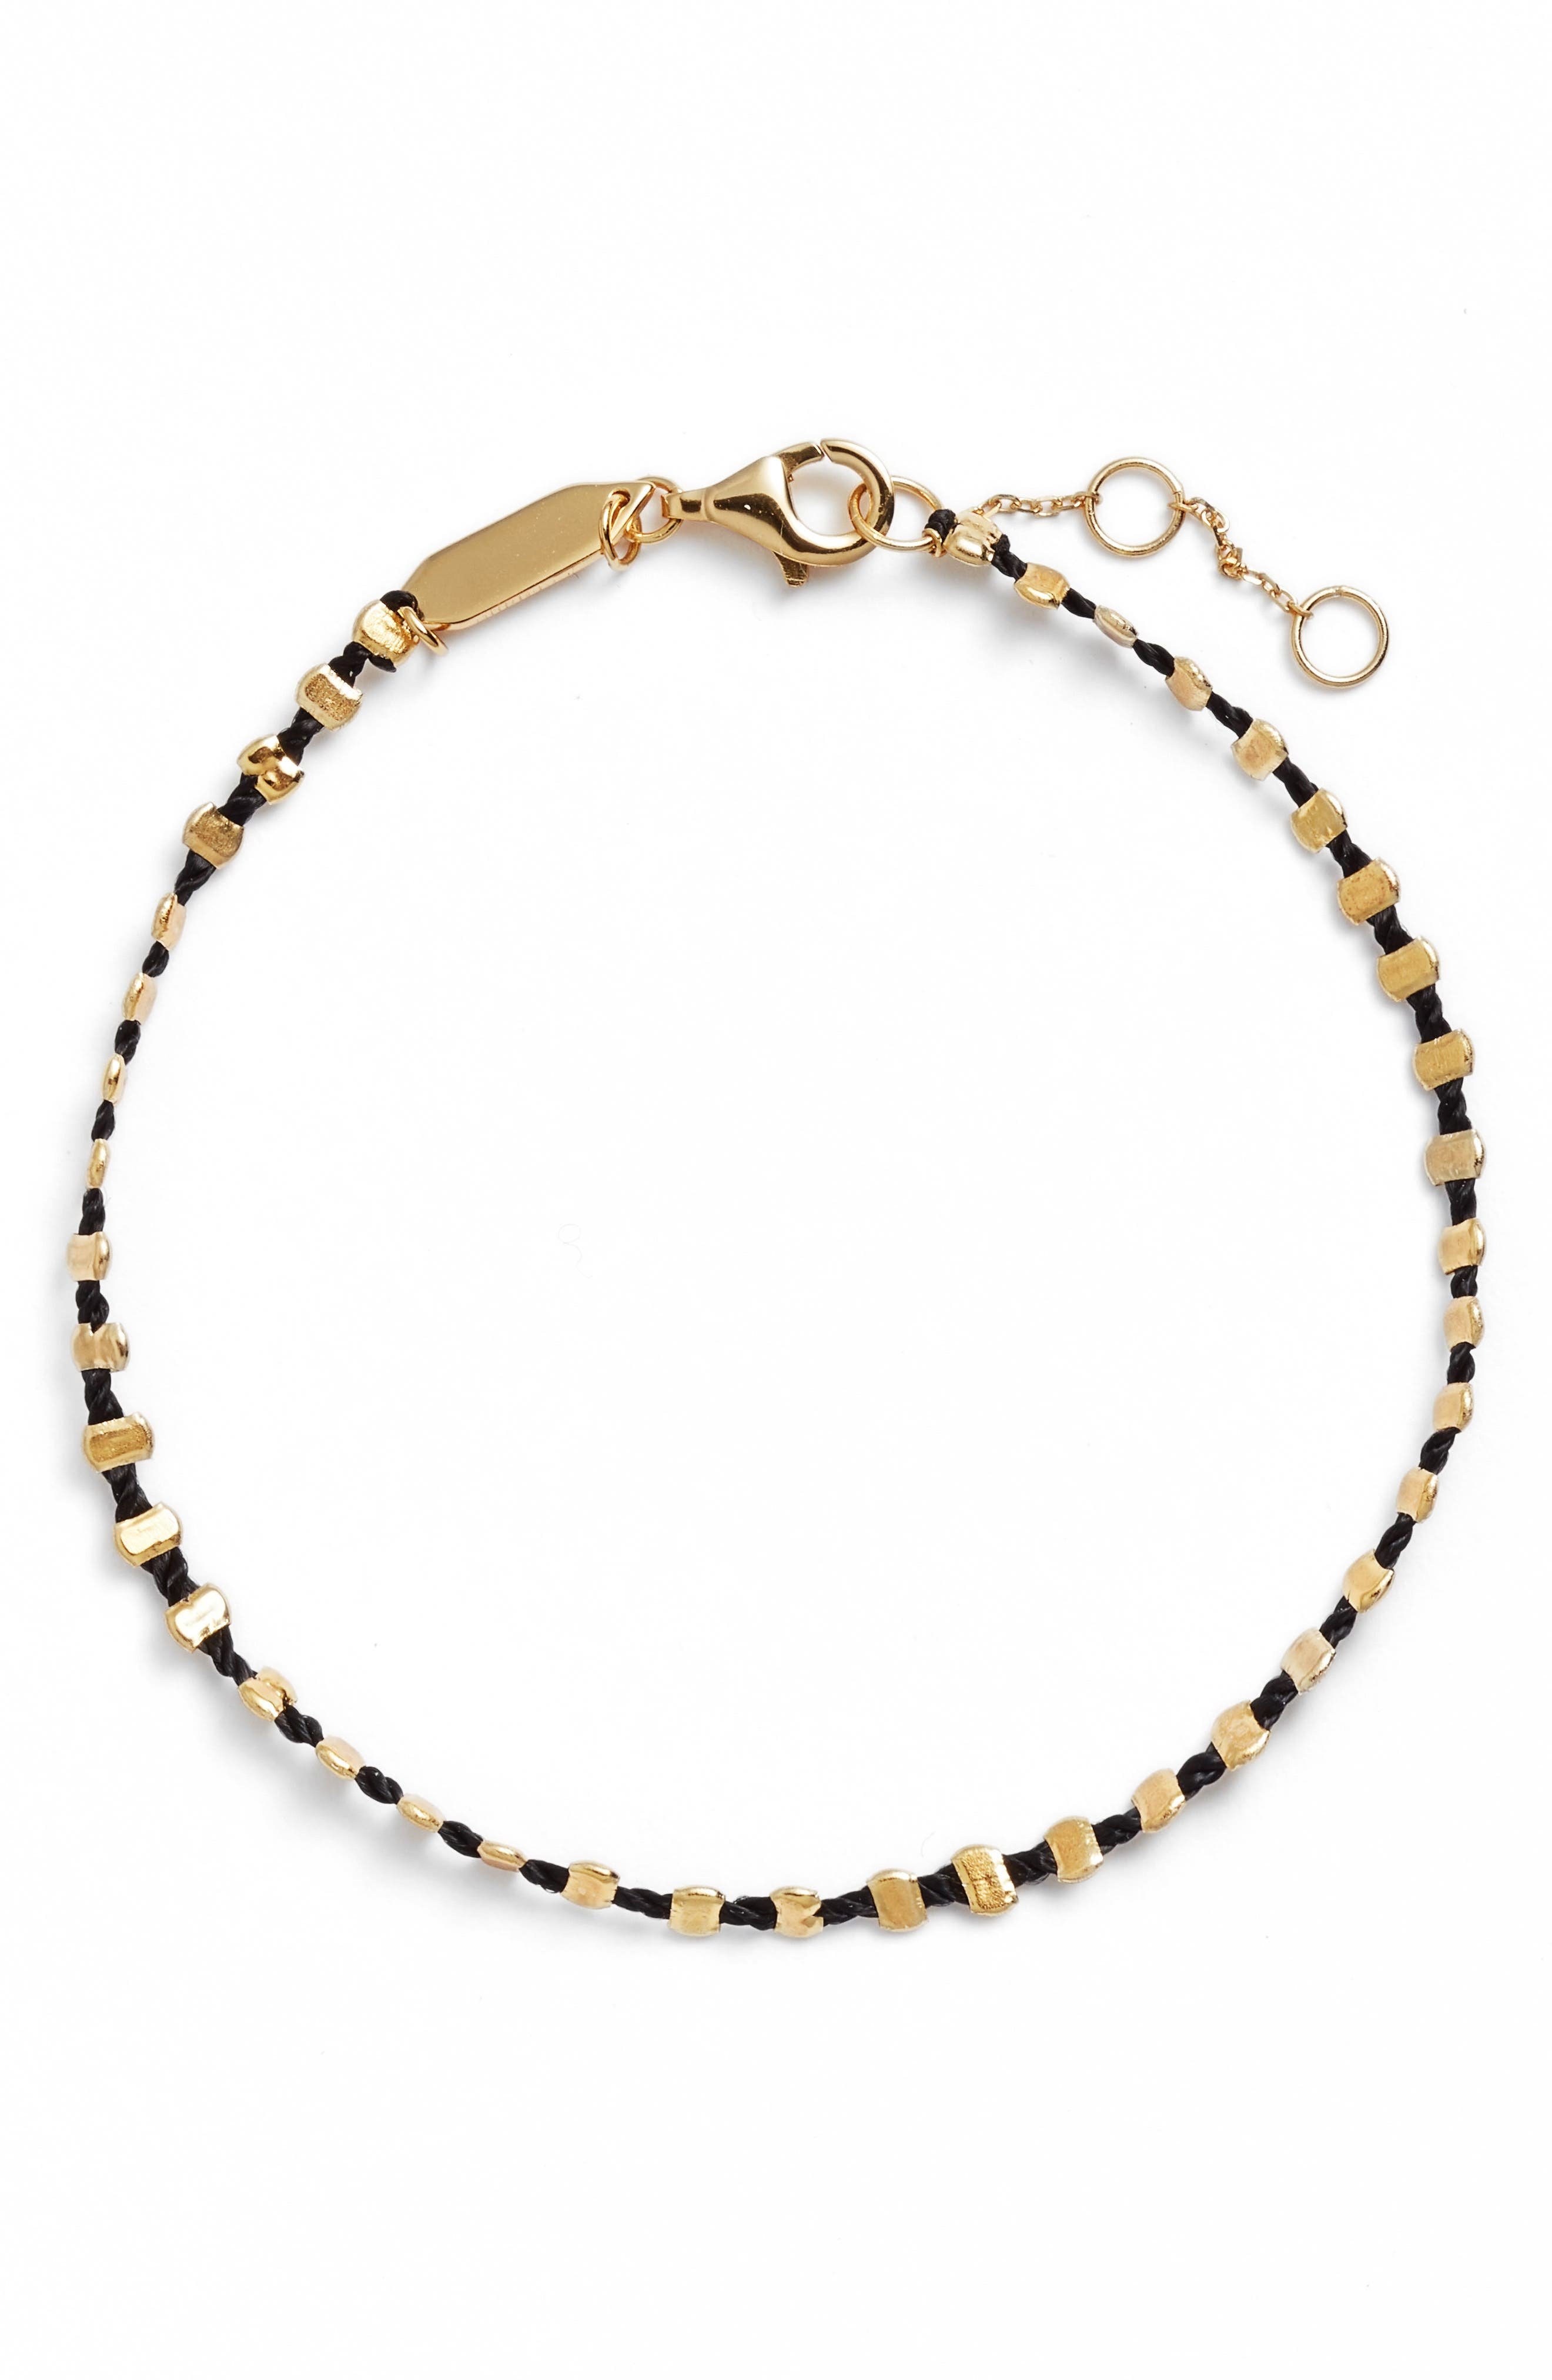 Sydney Vermeil Studded Black Band Bracelet,                             Main thumbnail 1, color,                             Gold